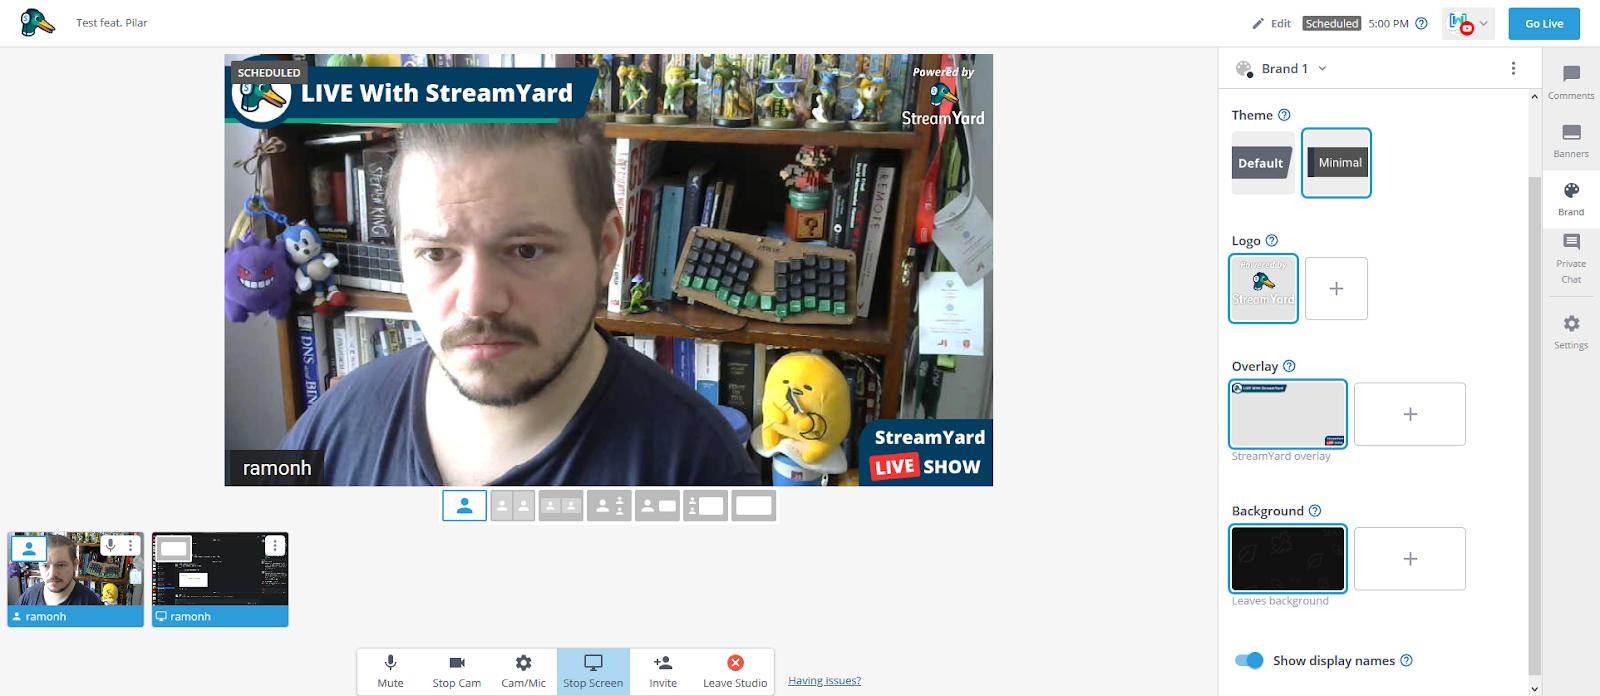 Screenshot of me broadcasting myself on StreamYard